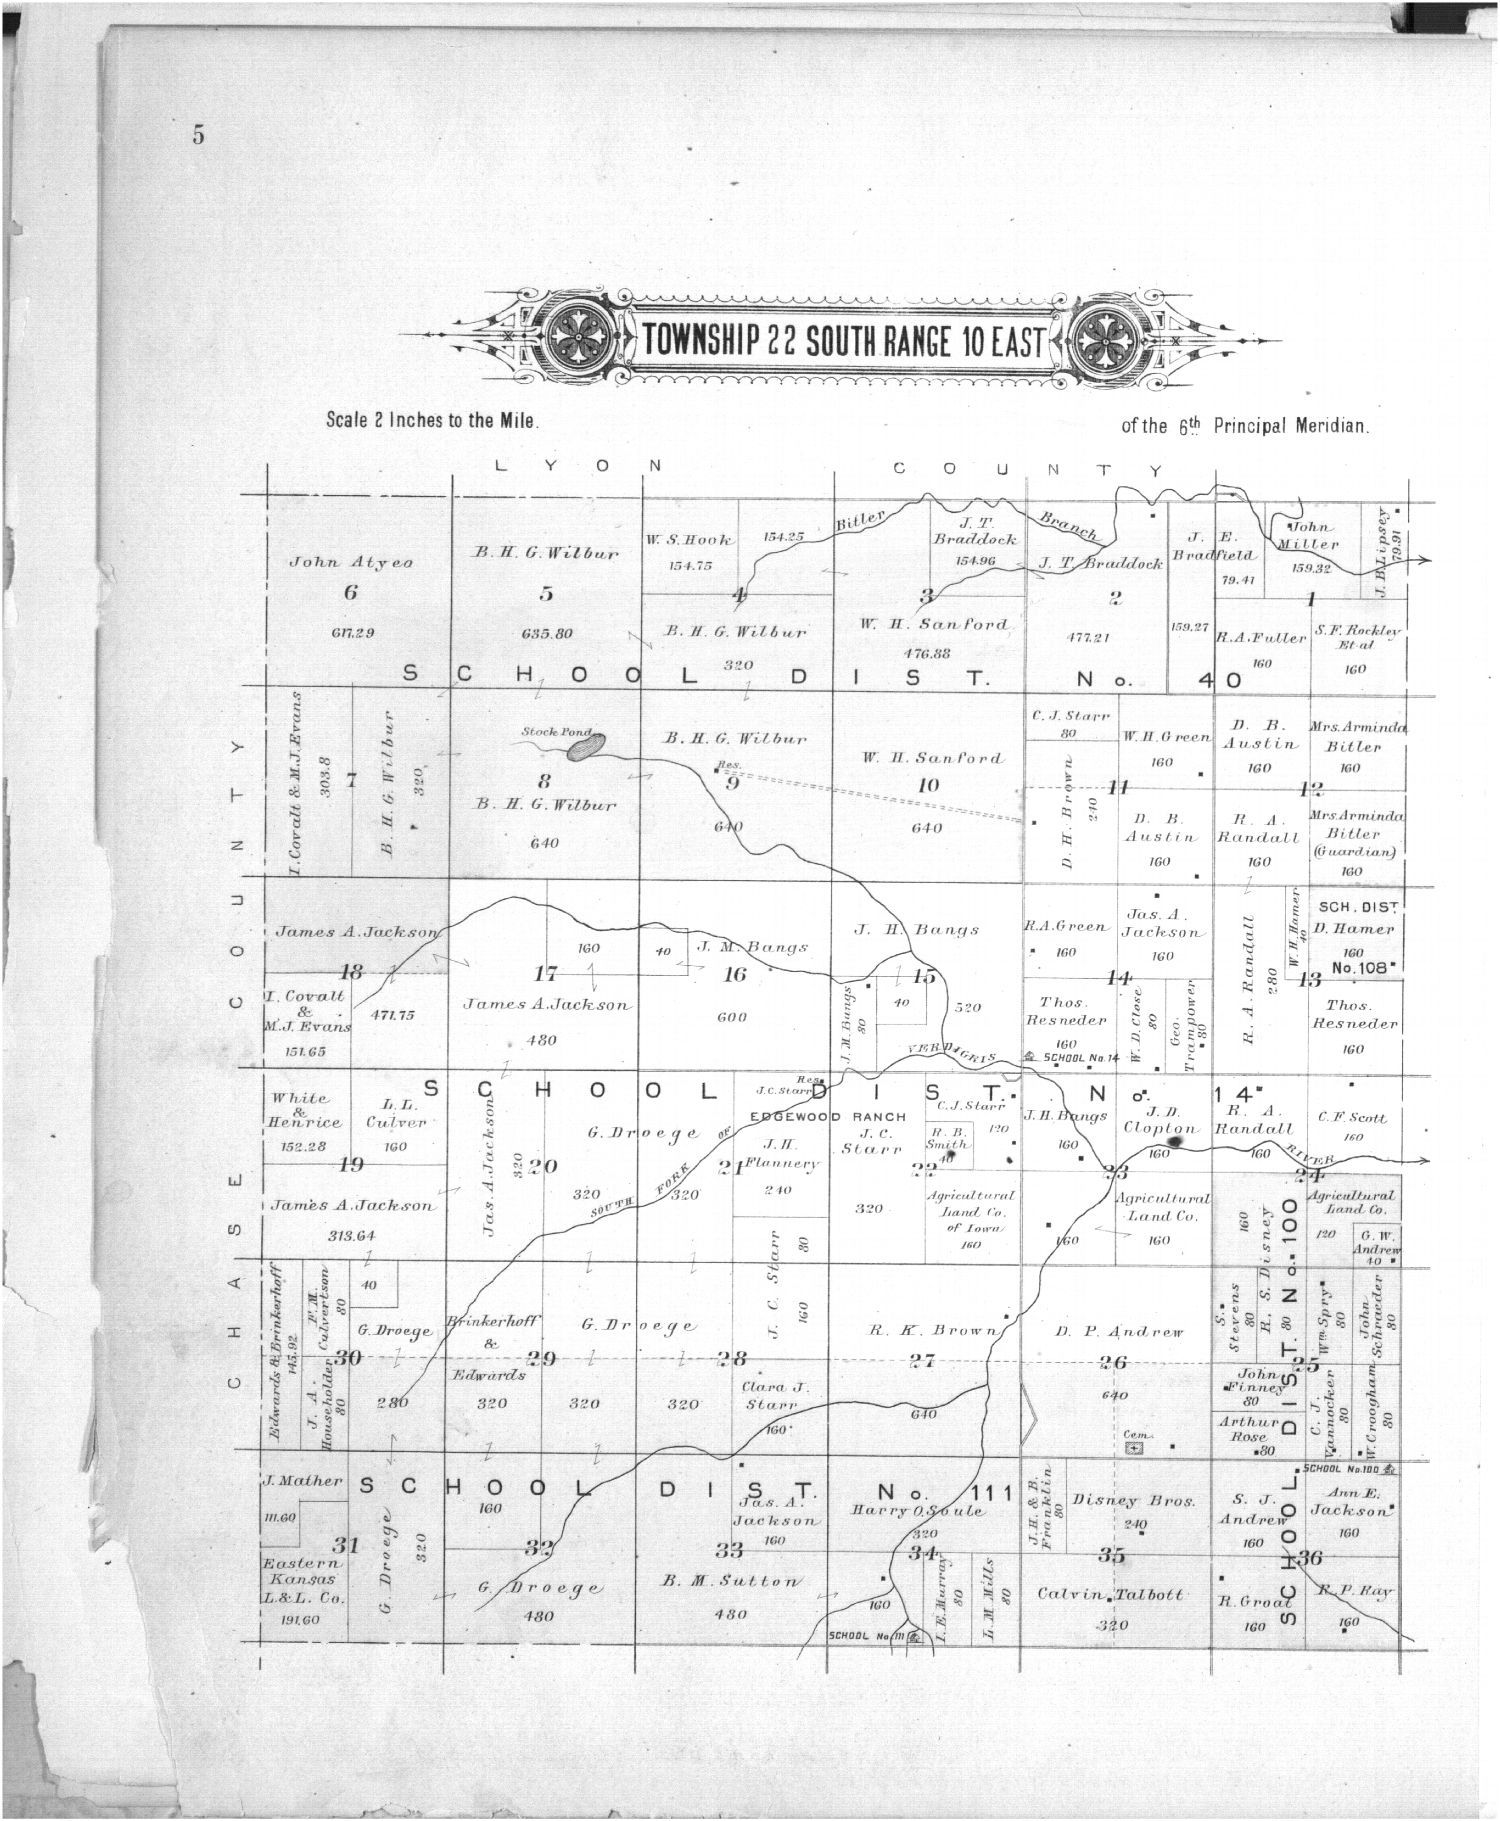 Plat book of Greenwood County, Kansas - 5